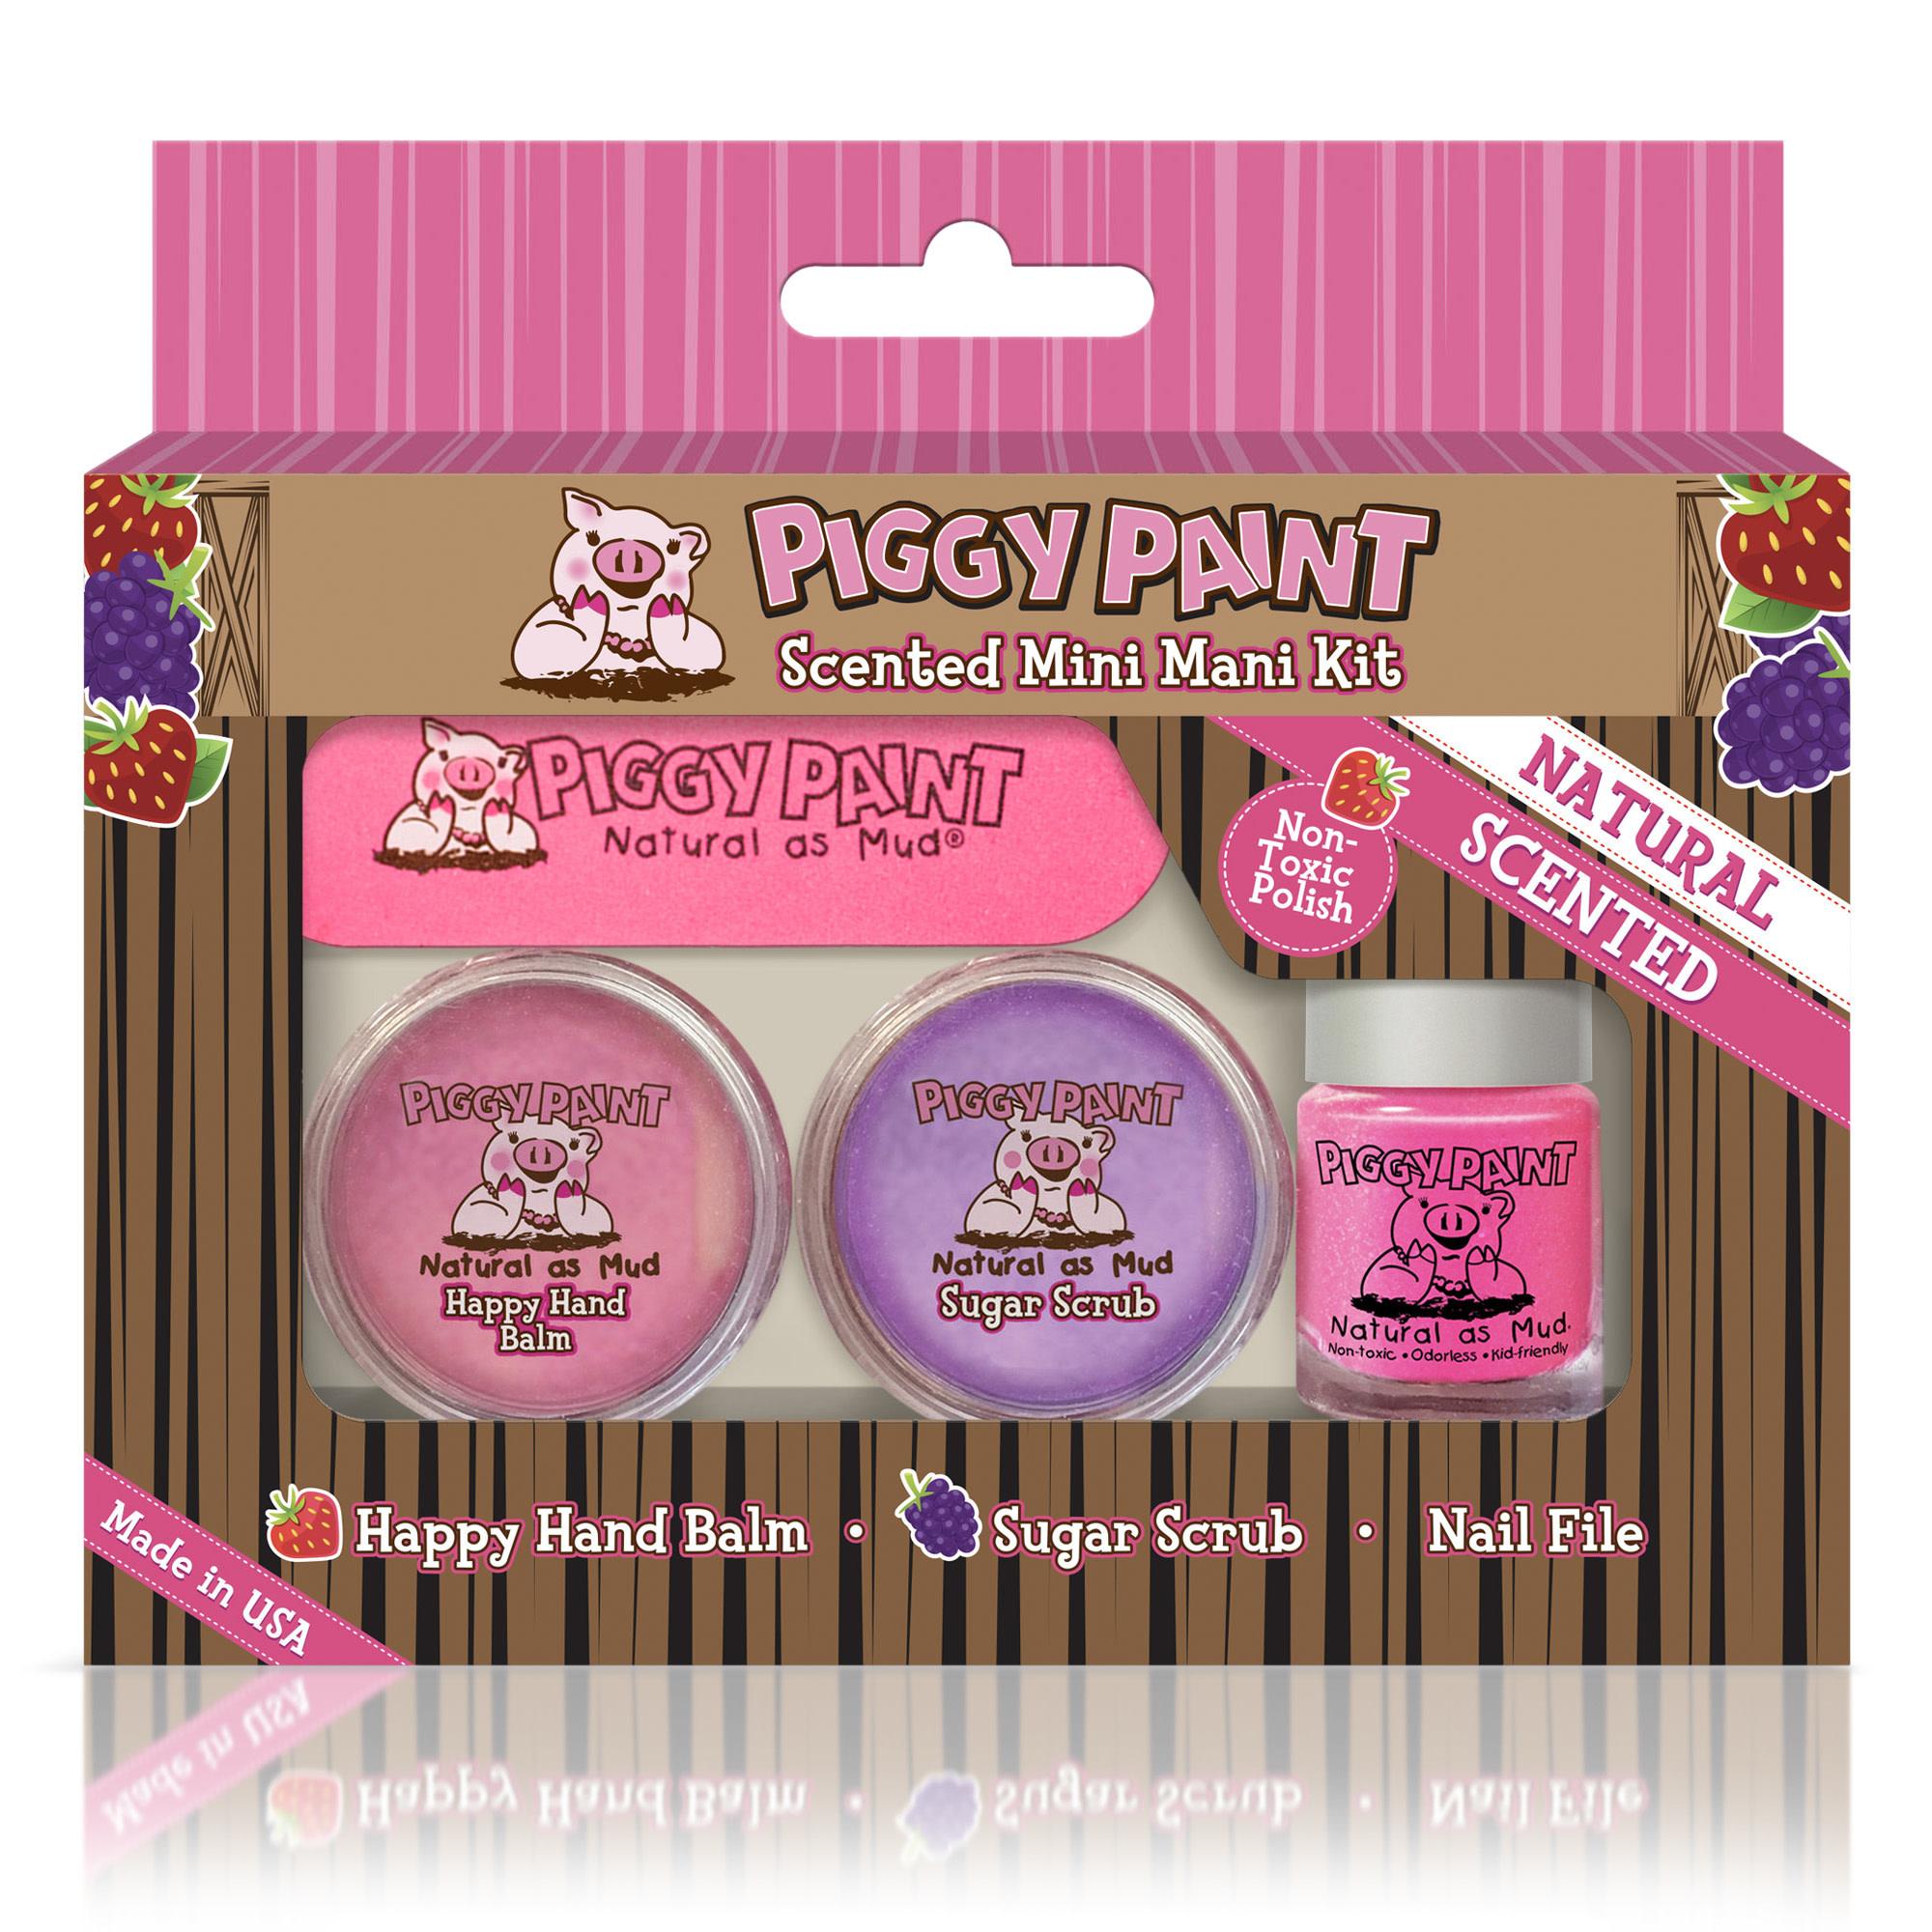 Piggy Paint Piggy Paint Sented Mini Mani Kit